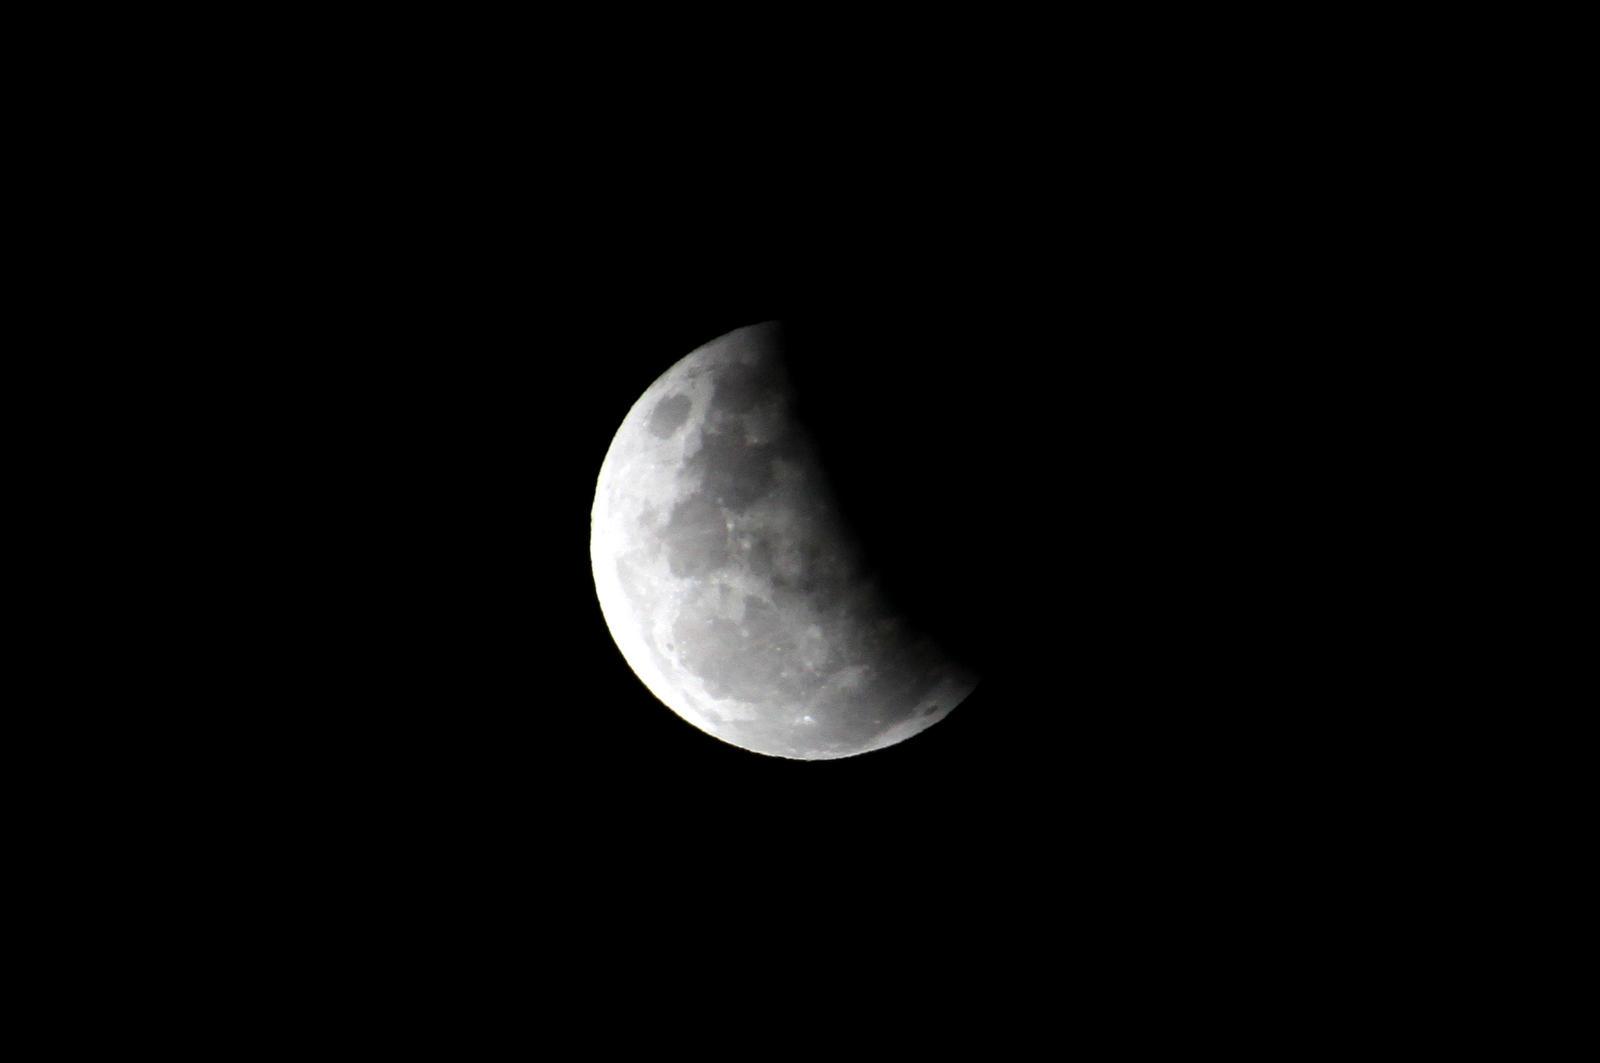 Partial Lunar Eclipse 4 by TarJakArt